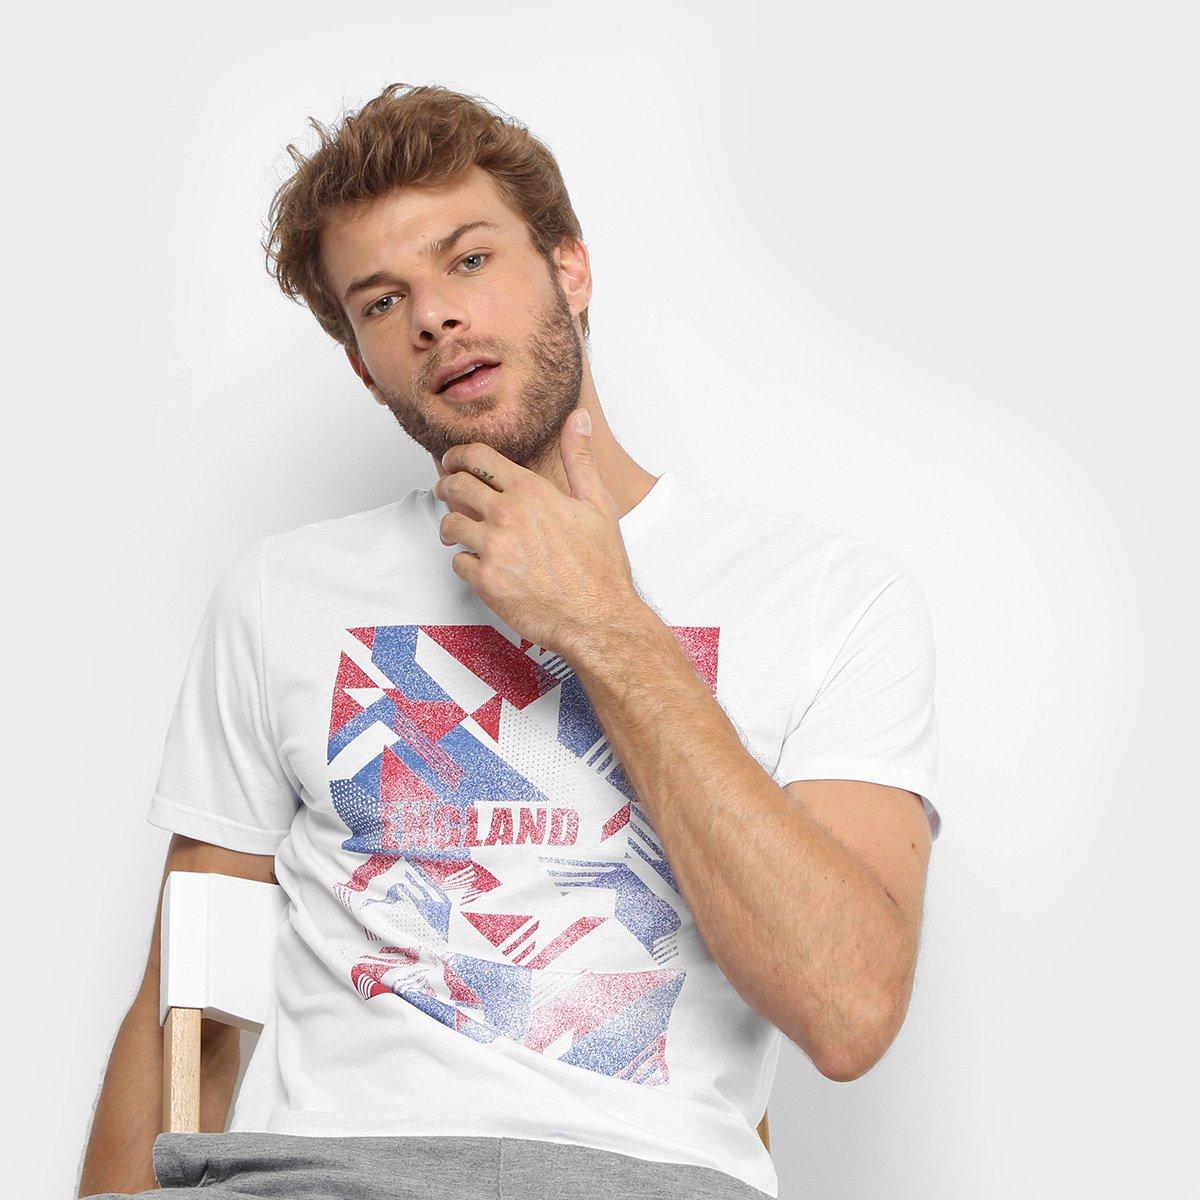 fe421f747cc7e Camiseta GONEW Box Inglaterra Masculina - Compre Agora